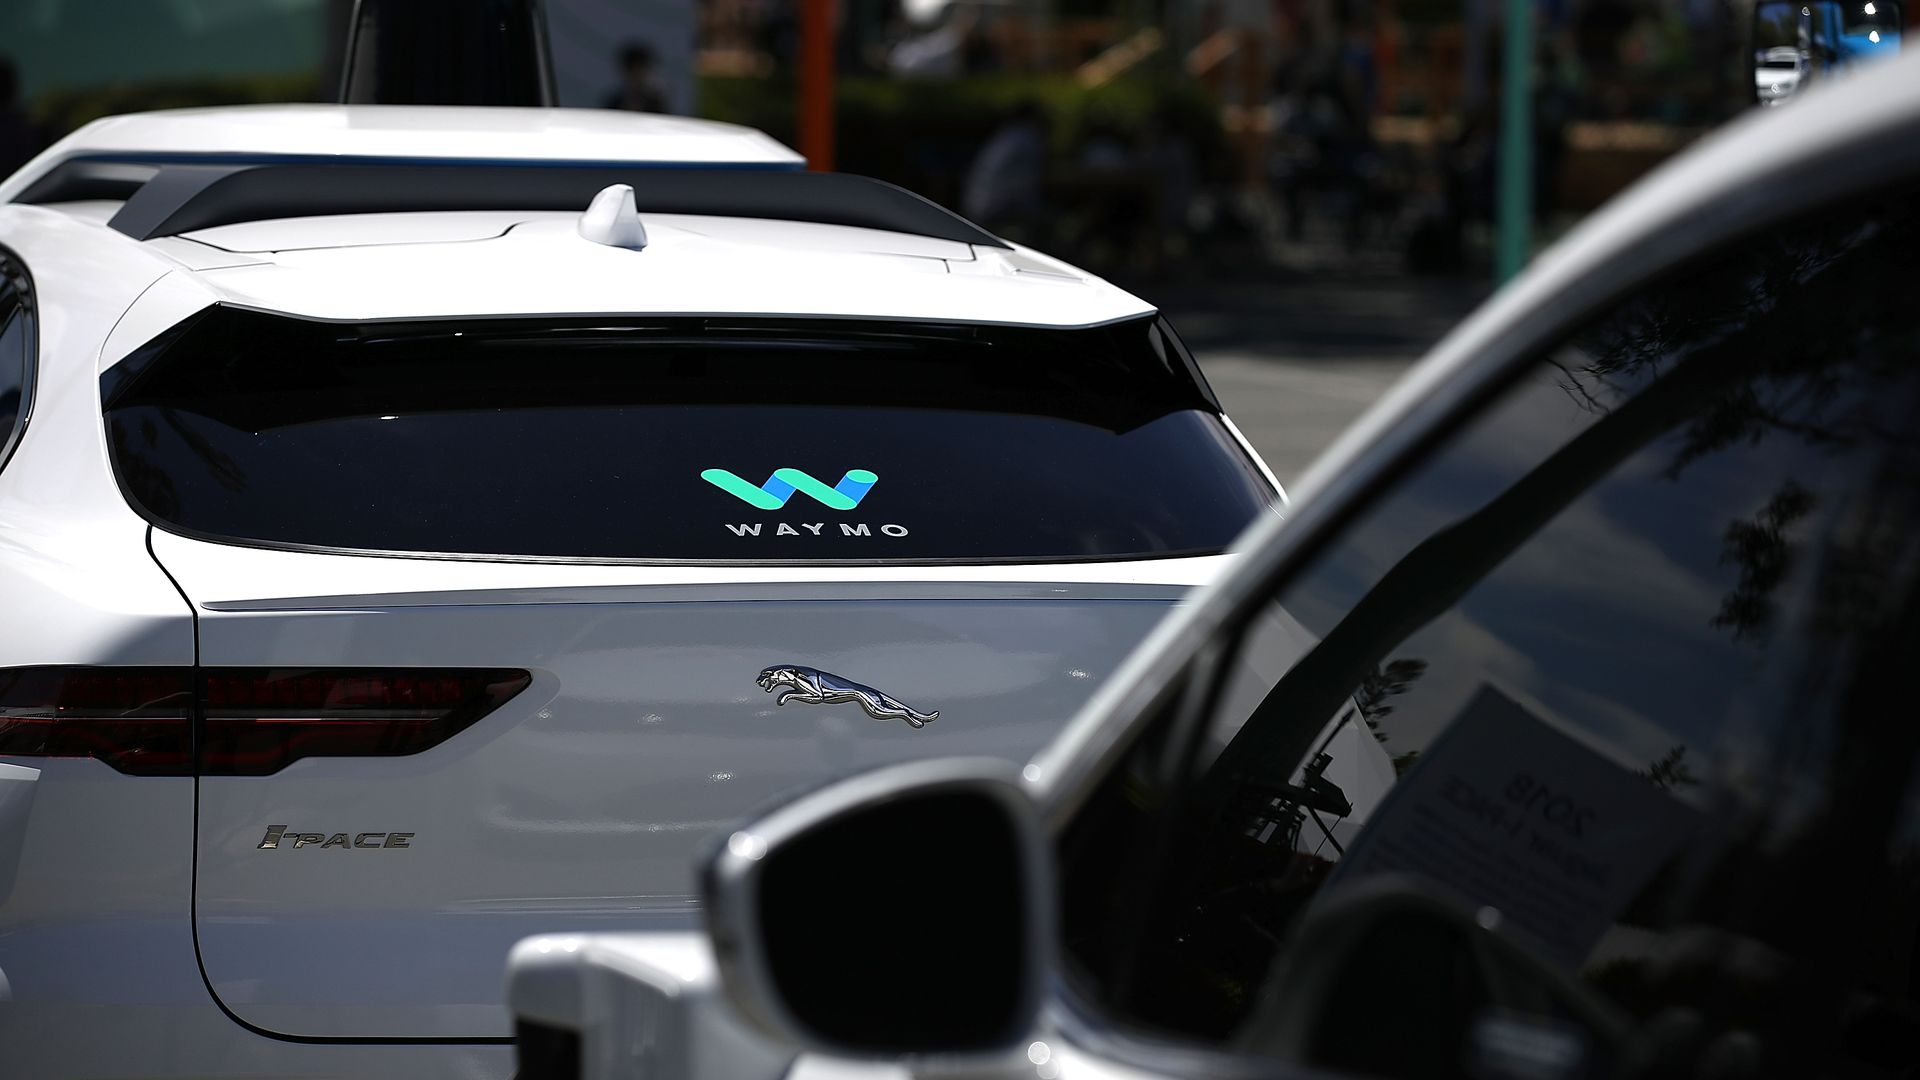 Waymo self-driving SUV